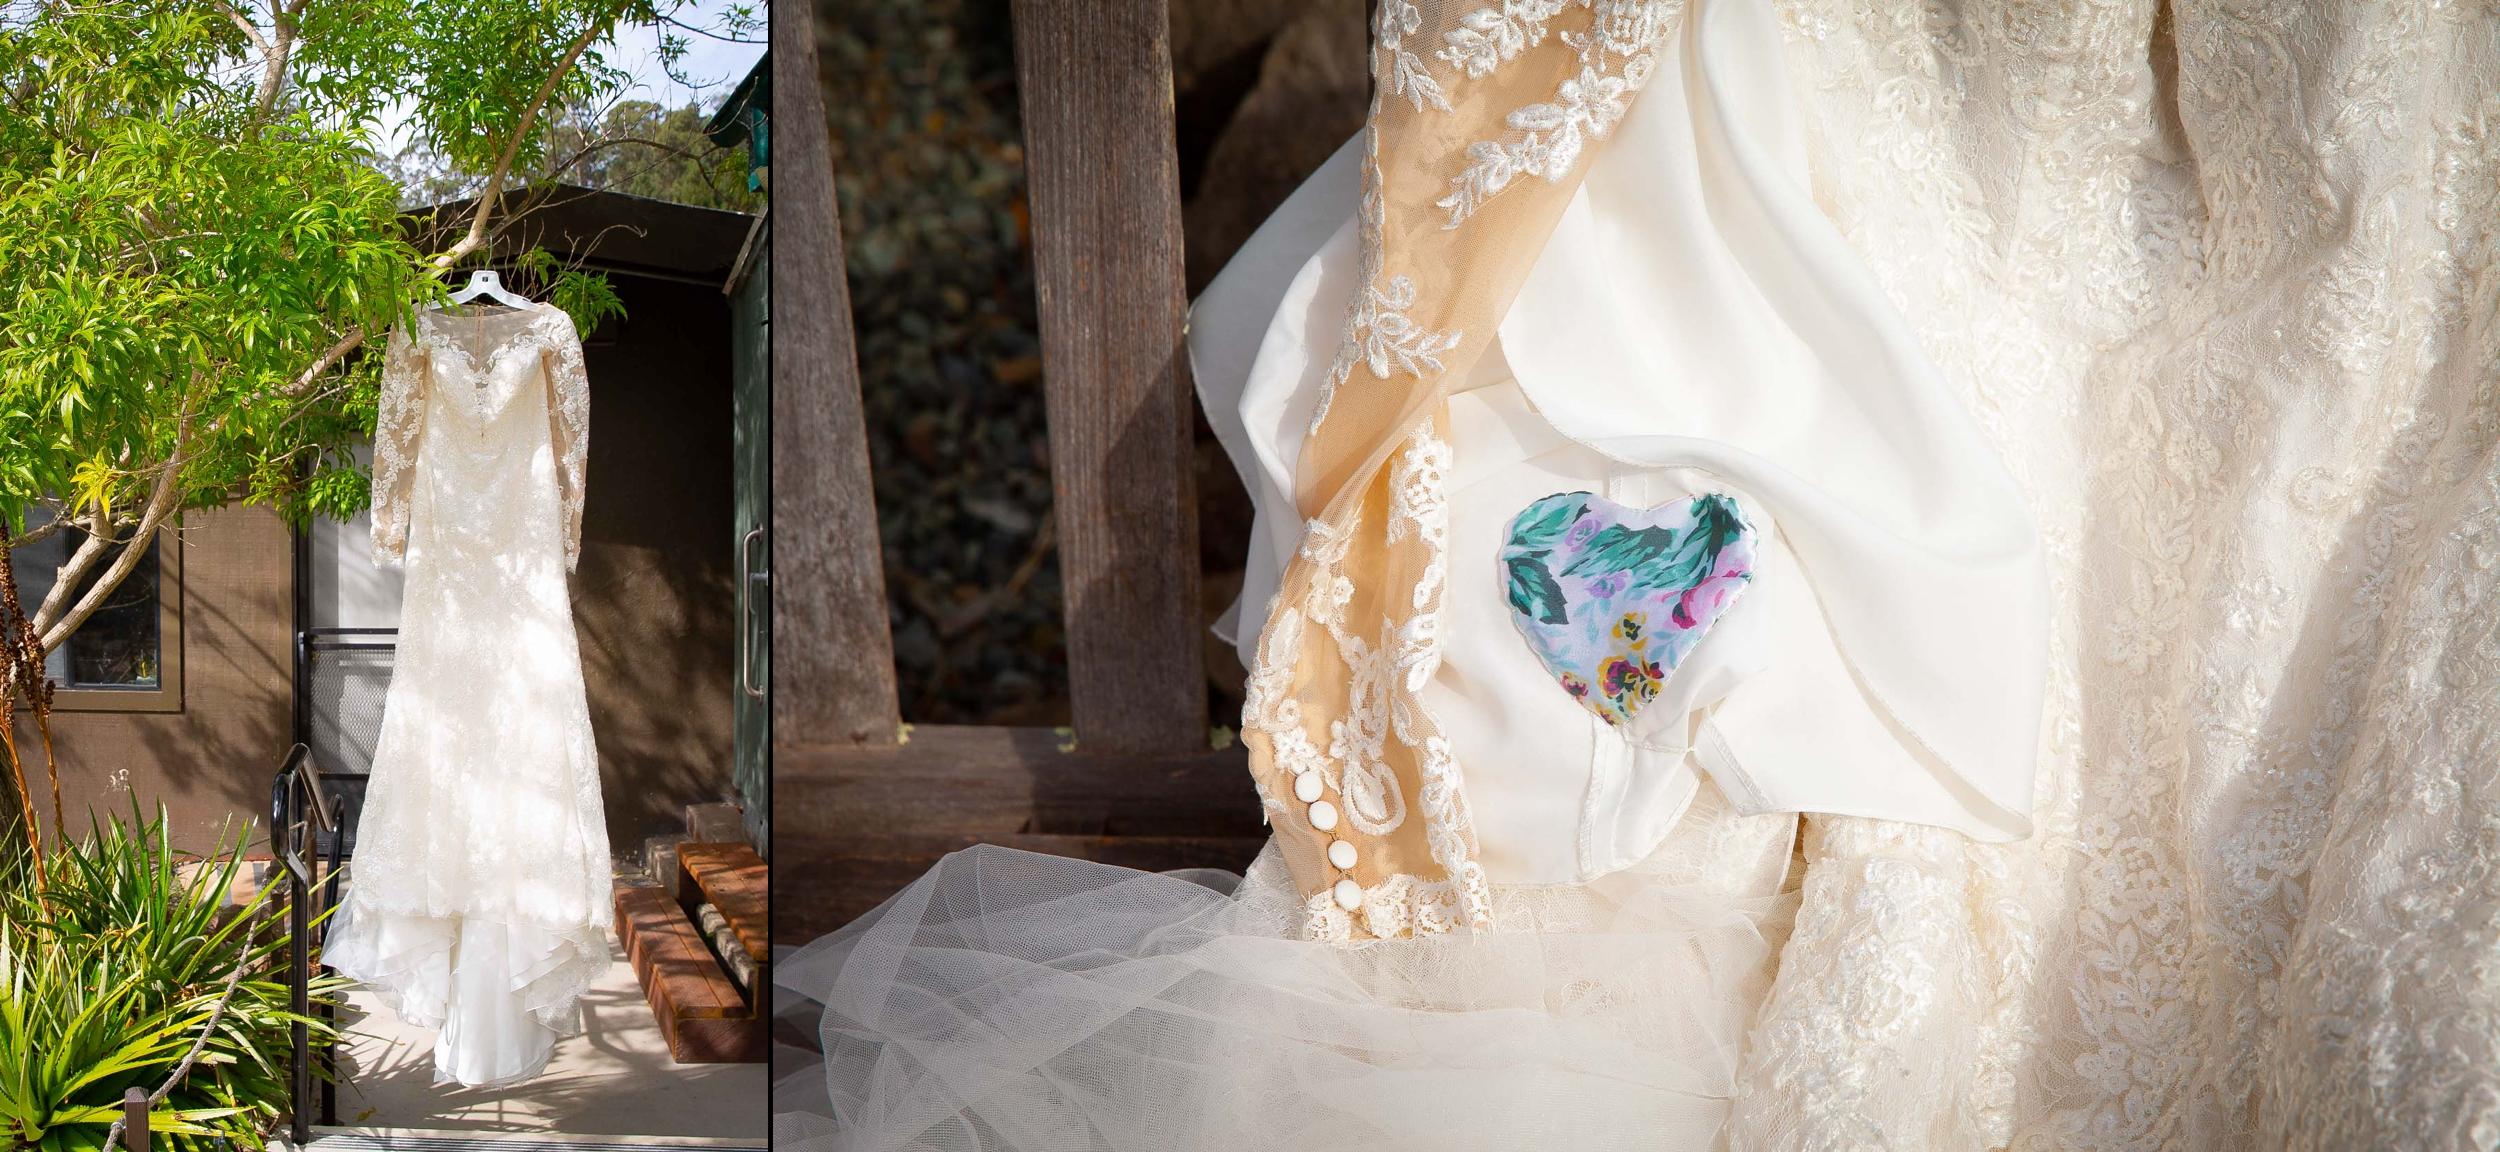 Berkeley Botanical Garden Wedding Ceremony in the Redwood Grove Ceremony and SF Bay Wedding Cruise Reception-7.jpg